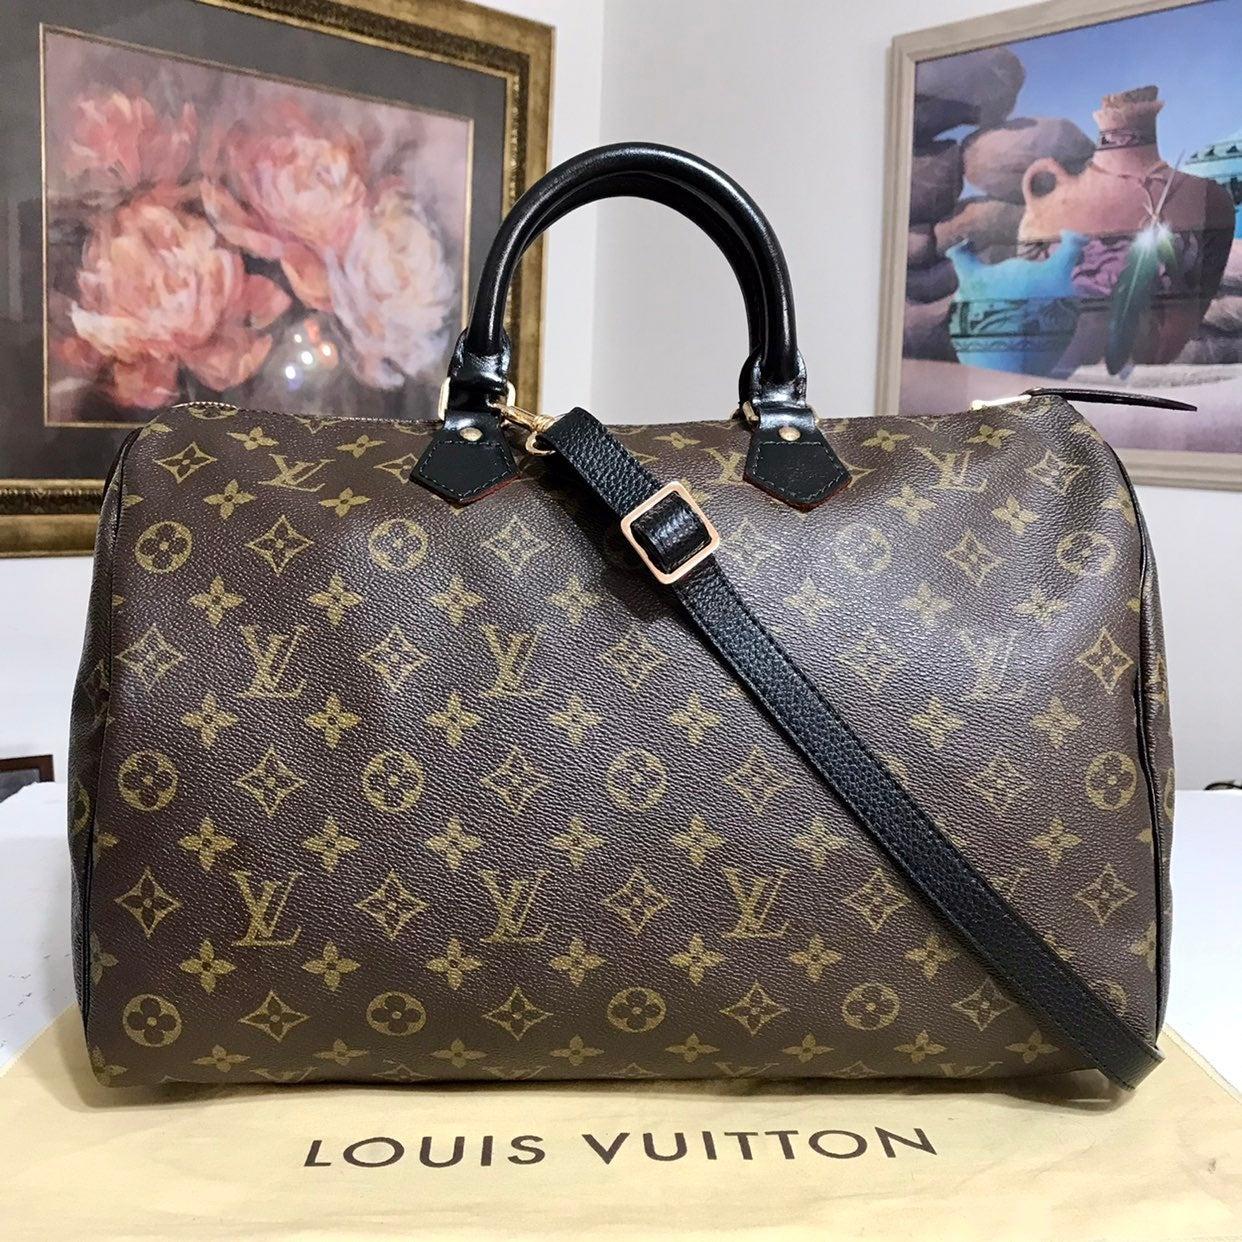 Louis Vuitton Speedy 35 Handbag-Black